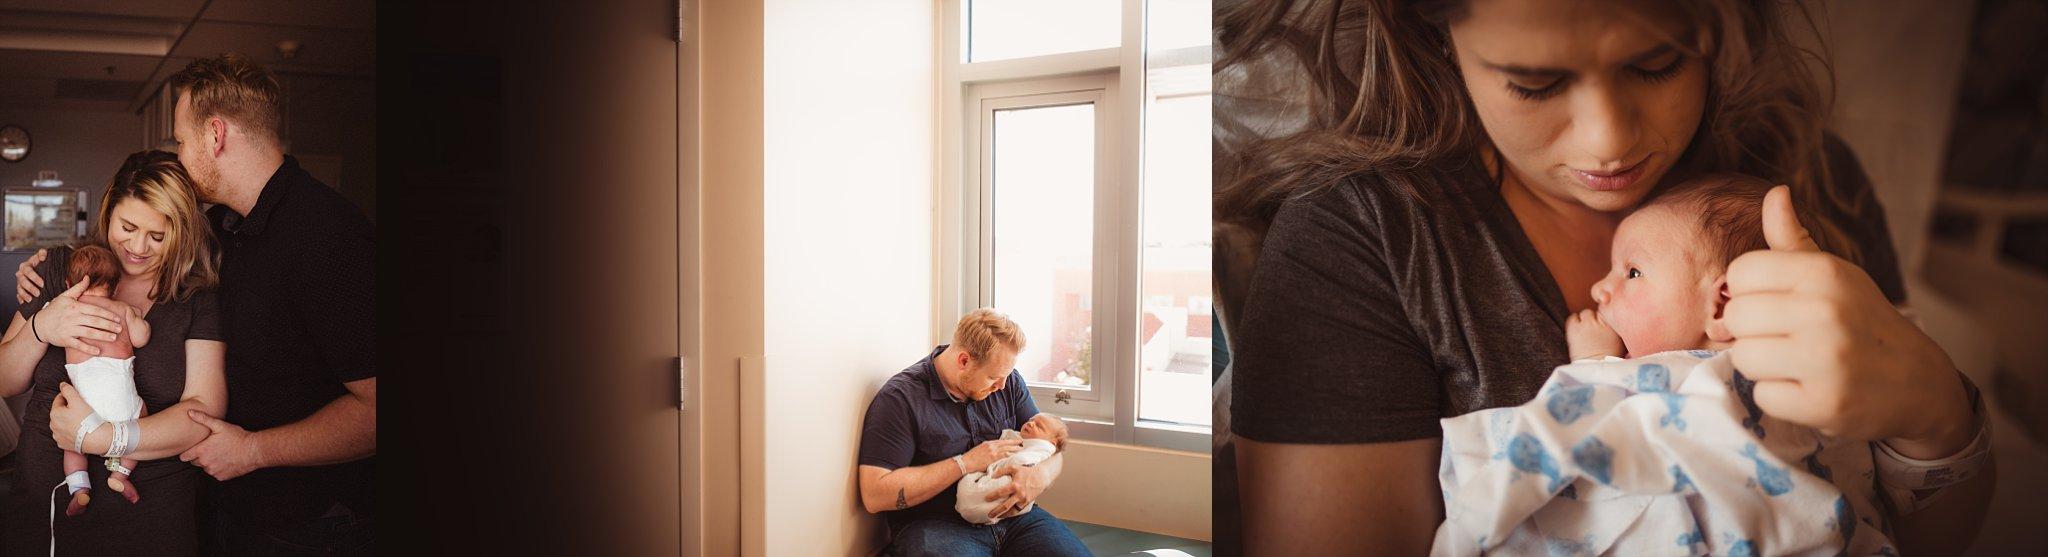 Becci Ravera Photography Family Newborn Photographer